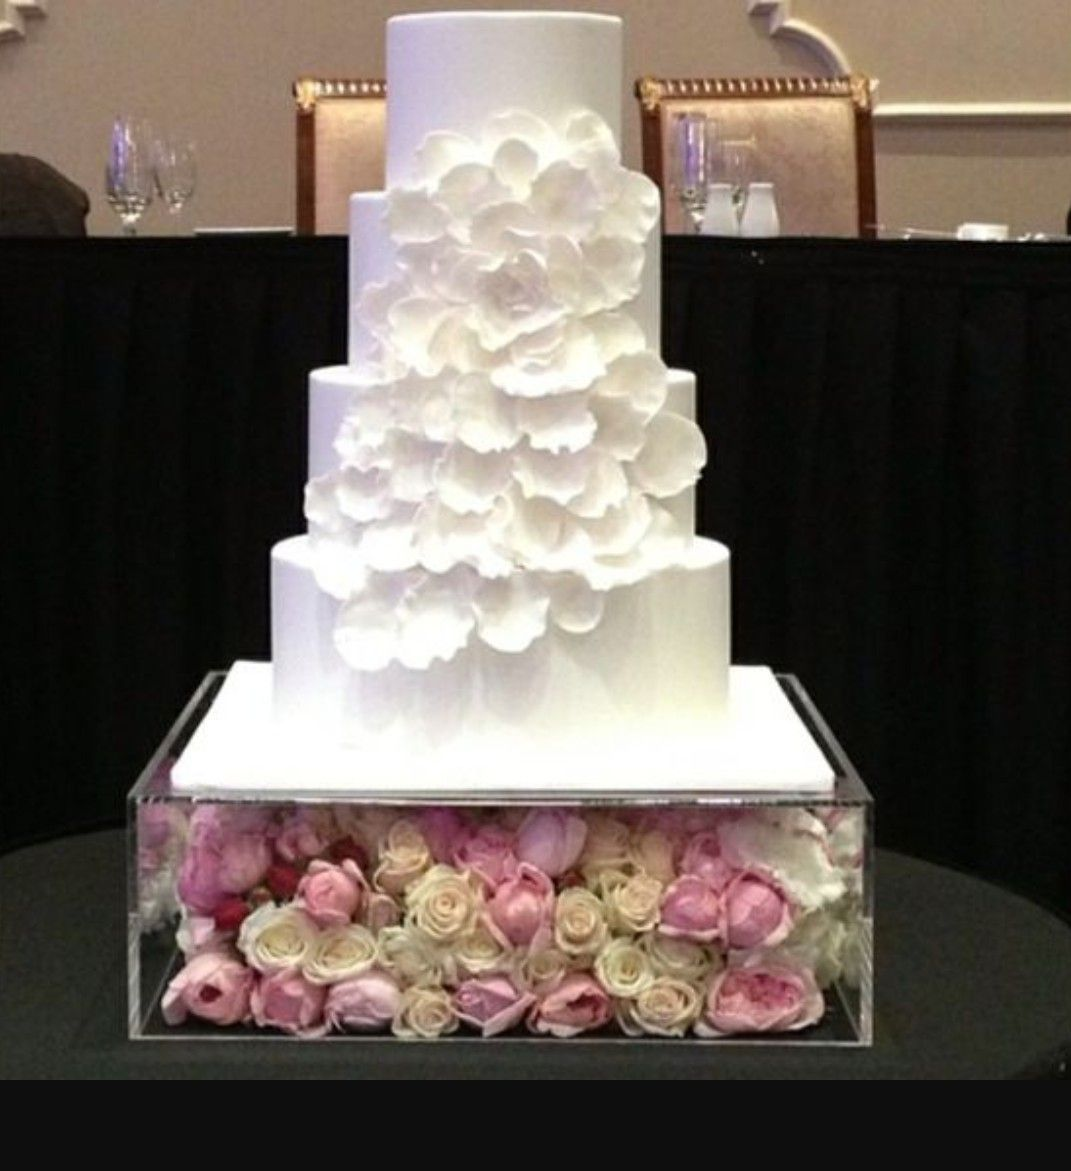 Acrylic display box with flowers wedding cake display